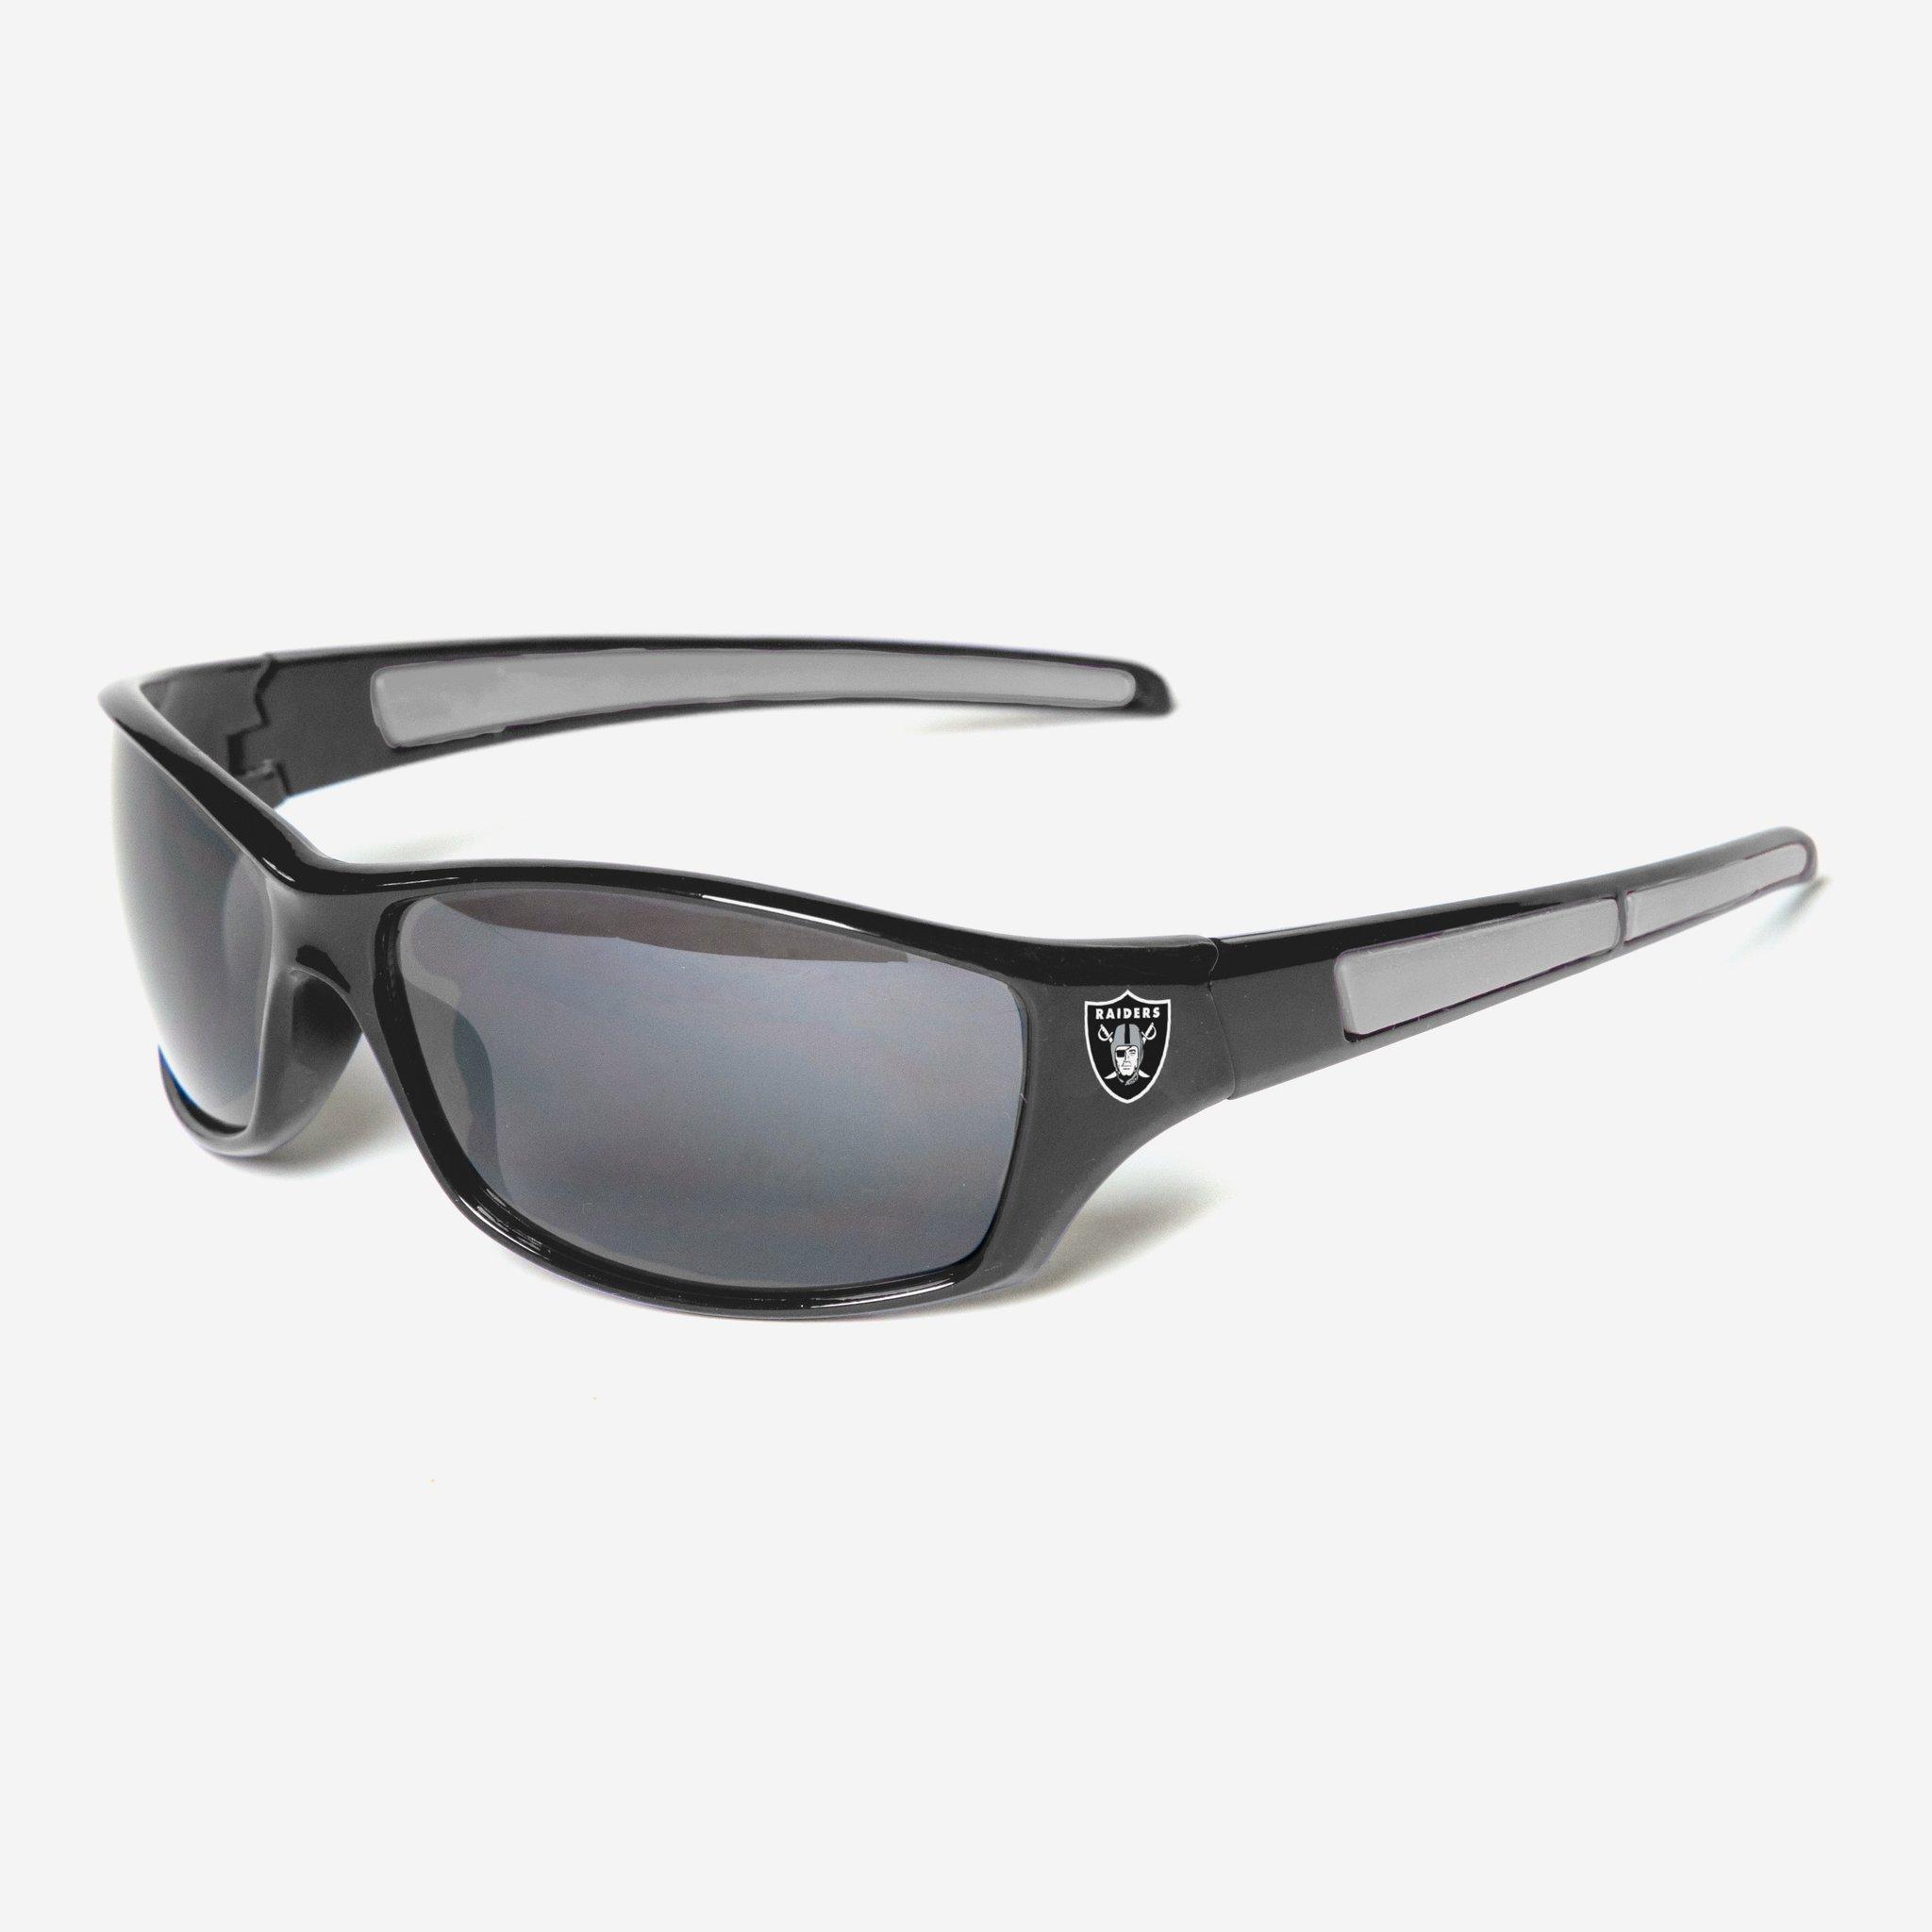 oakland-raiders-sunglasses